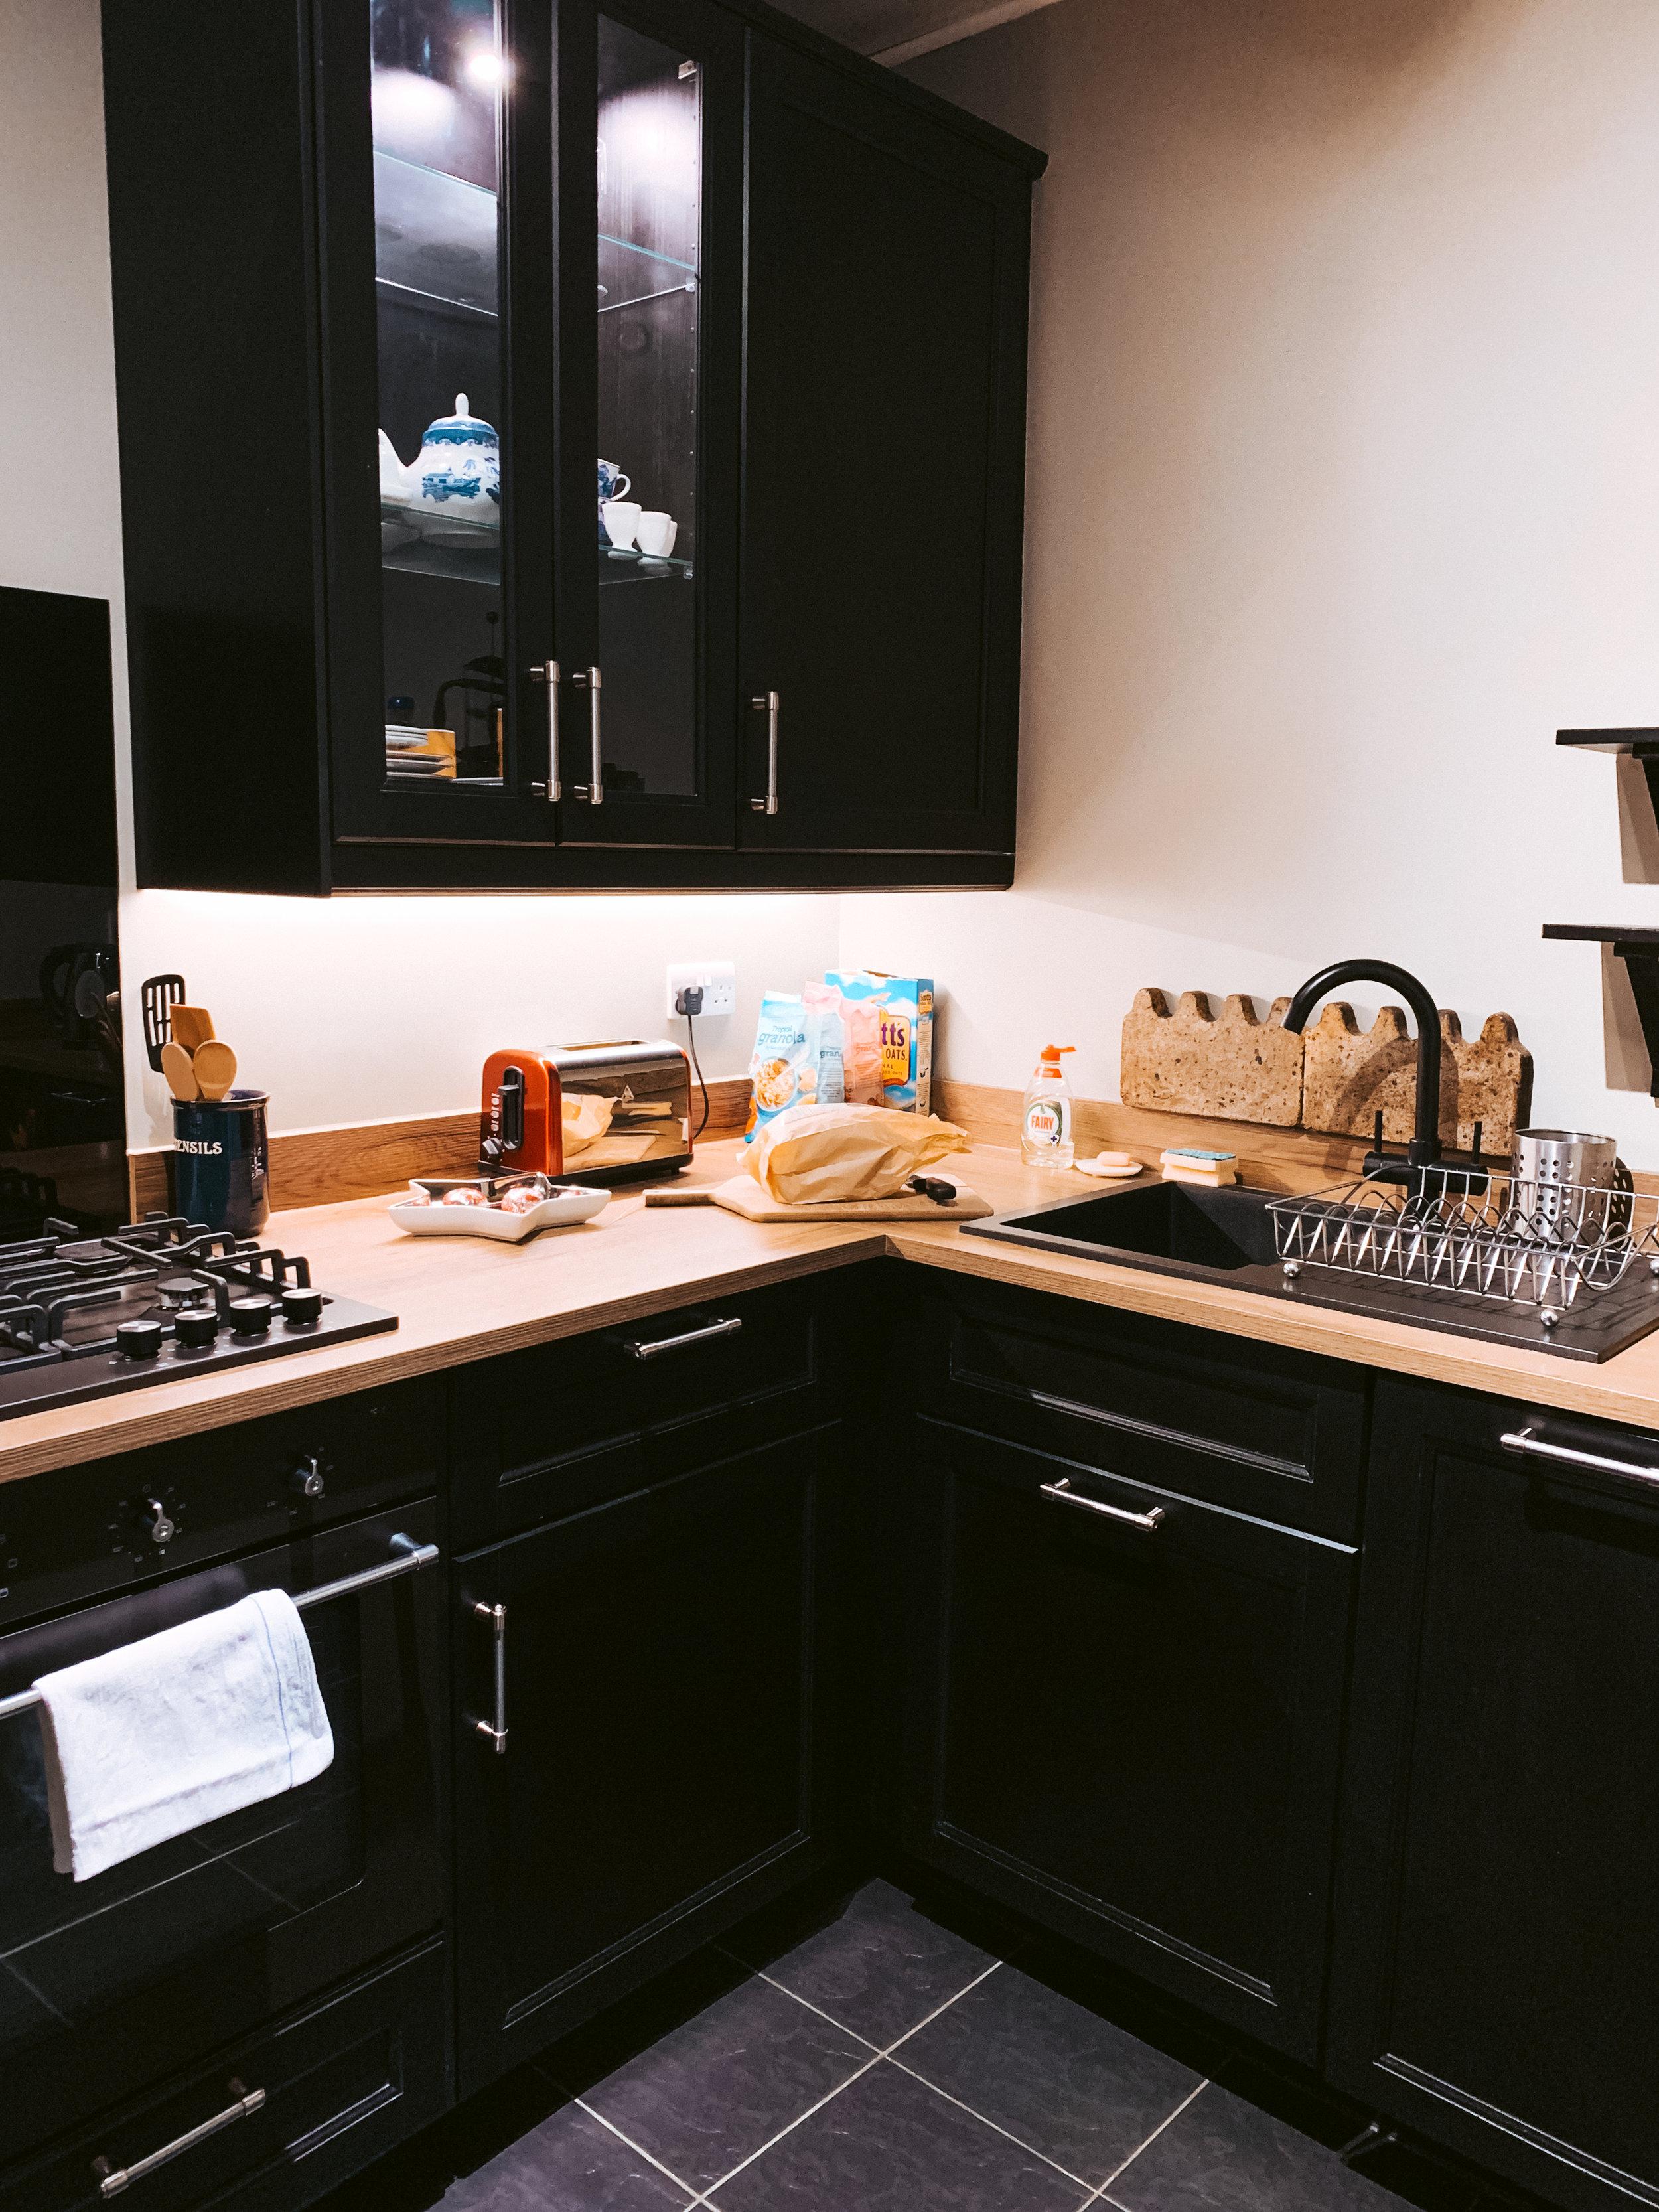 LSS Edinburgh Scotland Airbnb